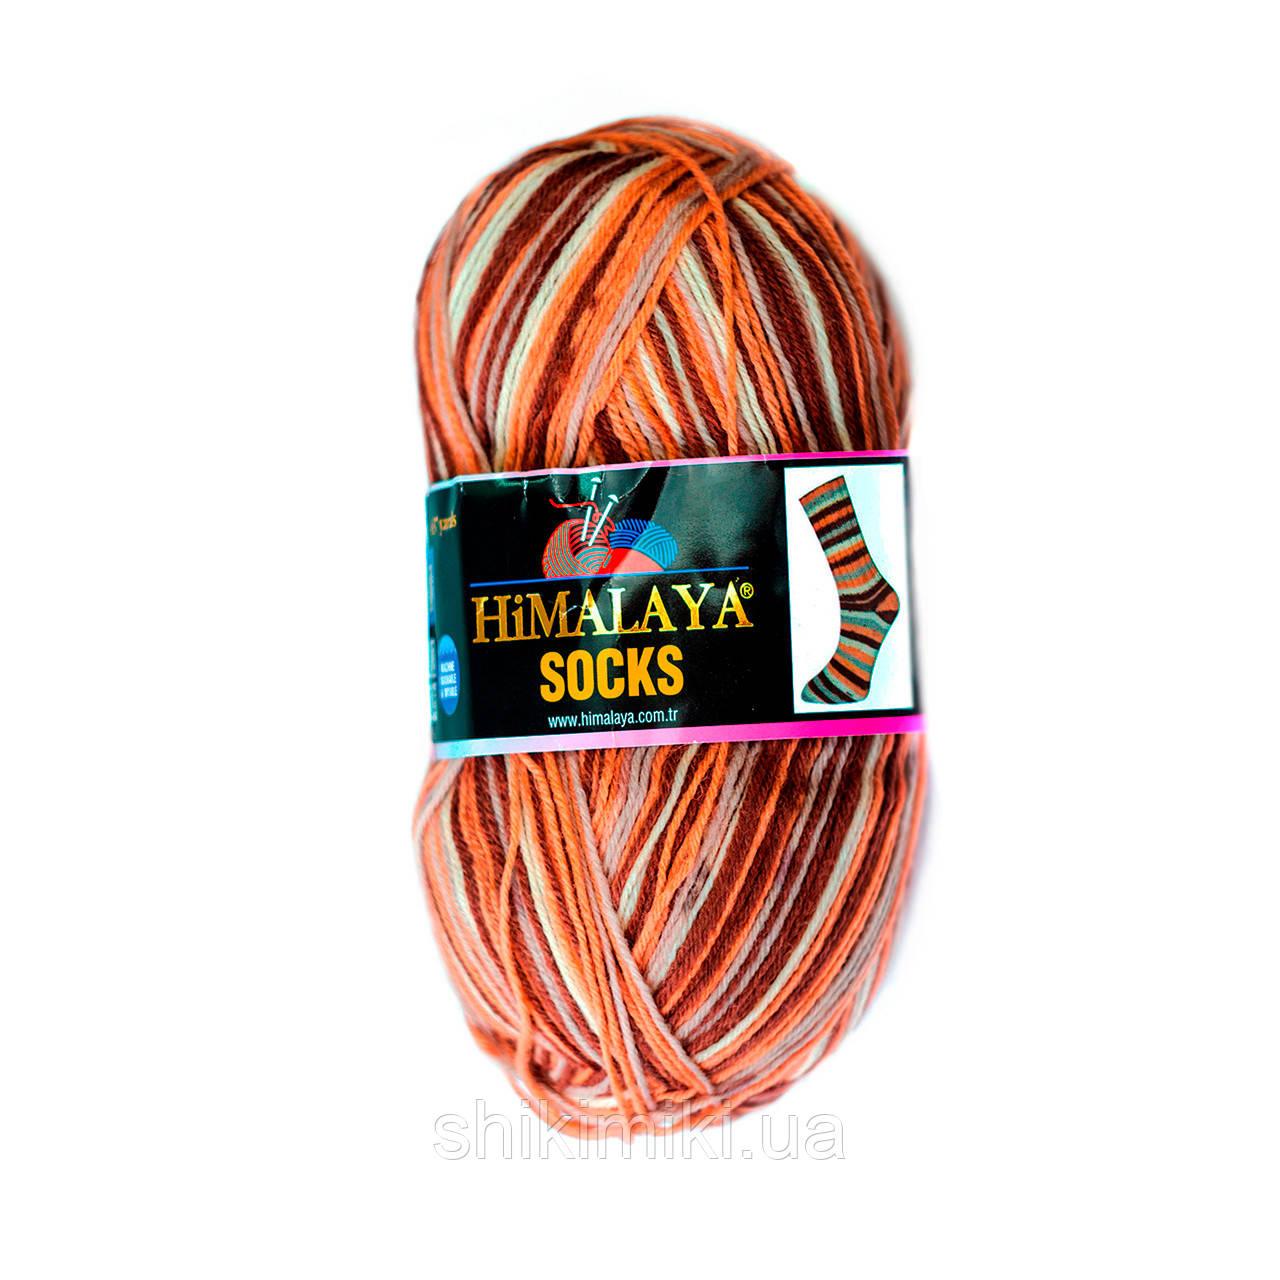 Пряжа Himalaya Socks Bamboo №120-01